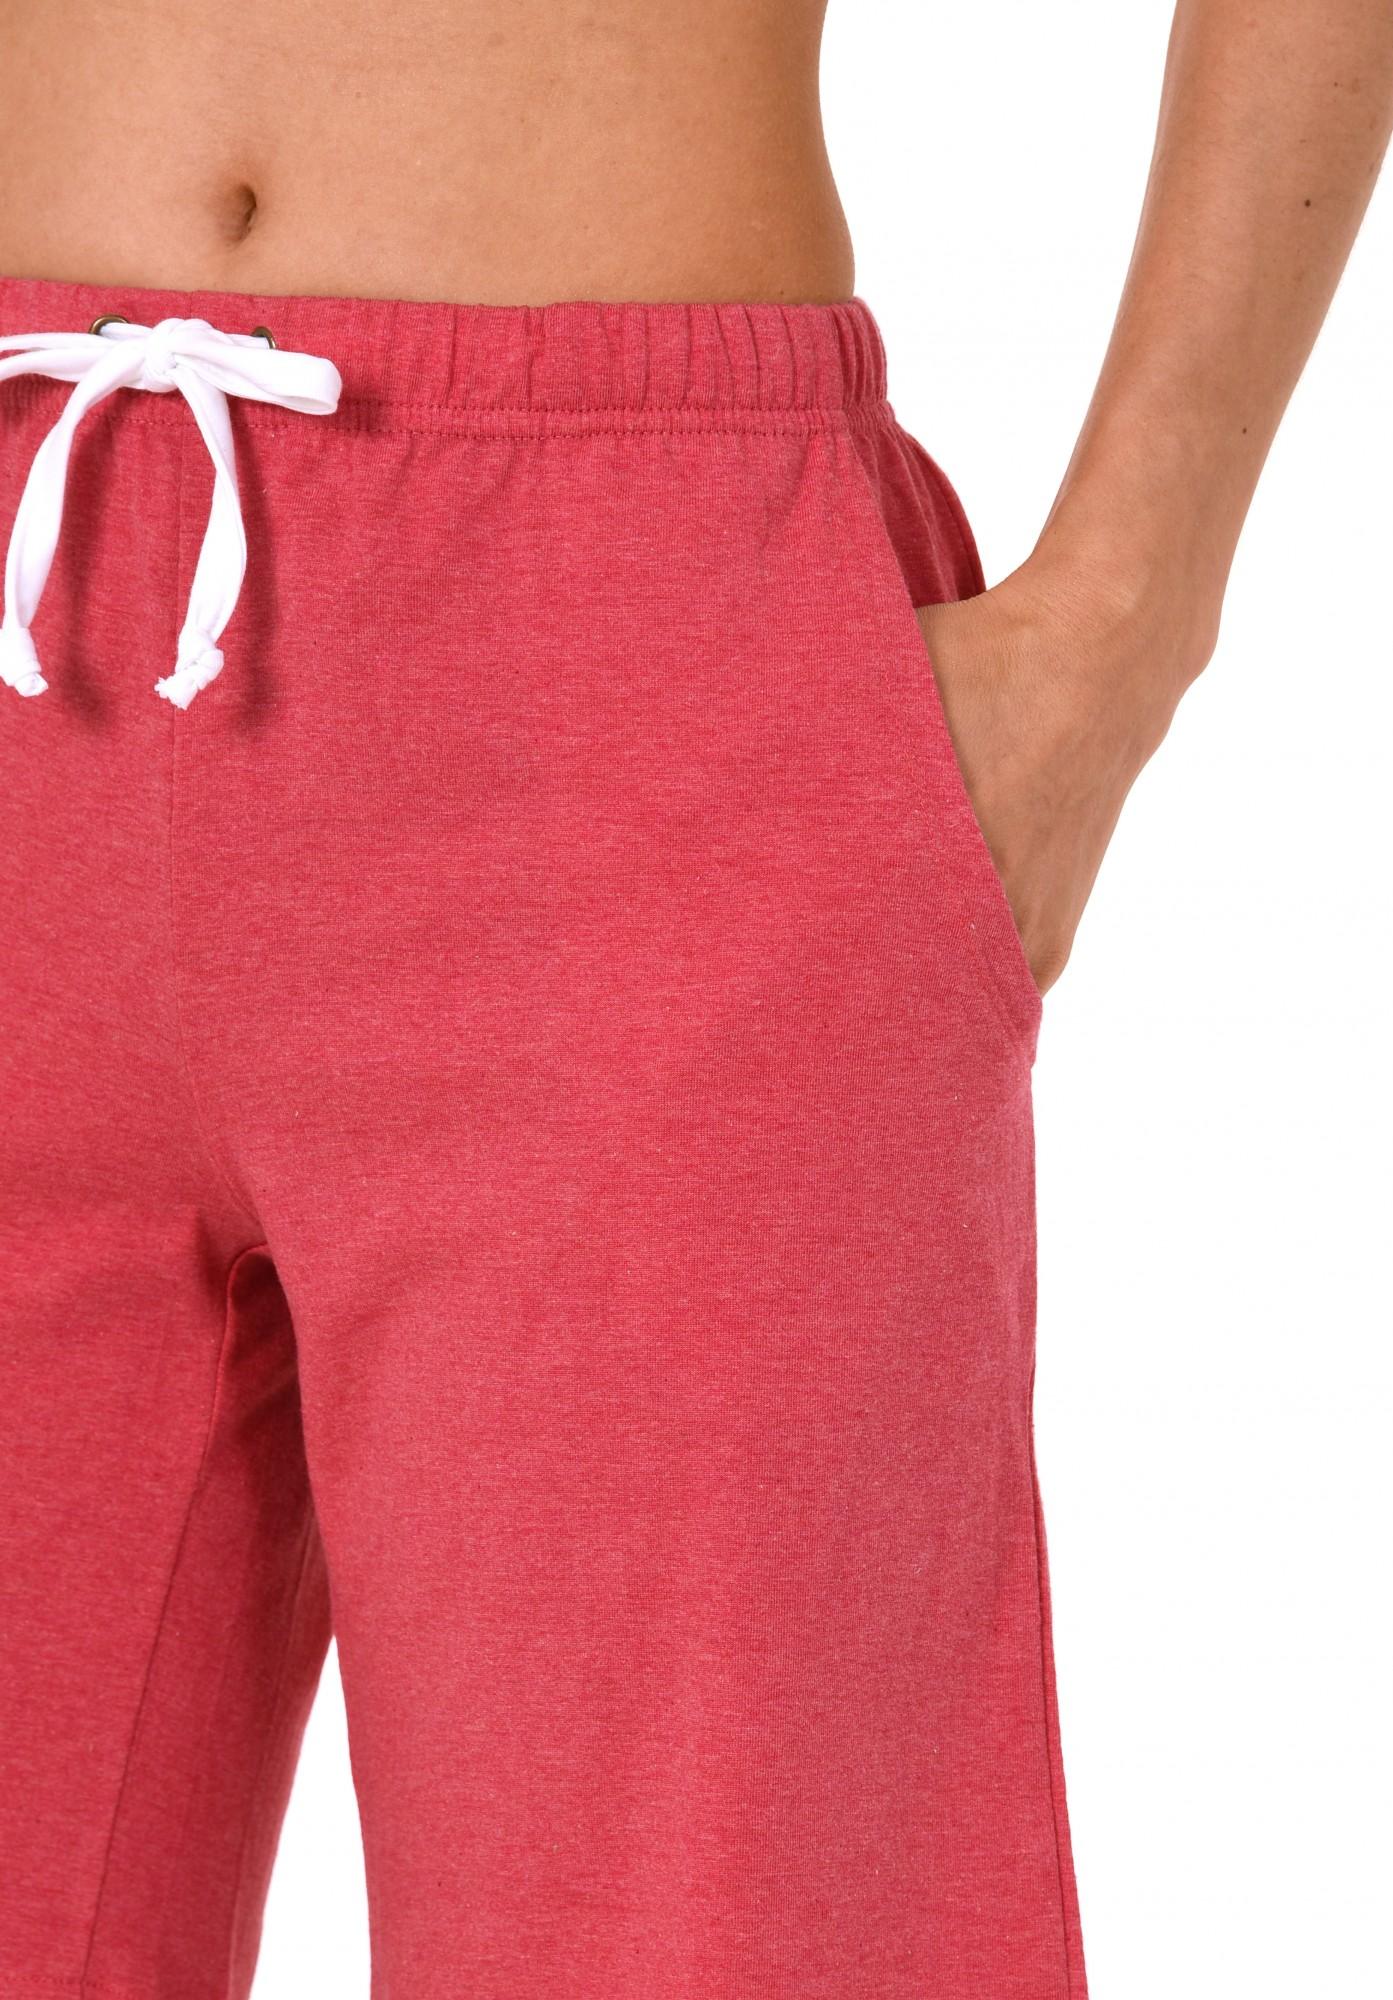 Damen Pyjama Bermuda kurze Hose  - Mix & Match - ideal zum kombinieren  224 90 902 – Bild 4